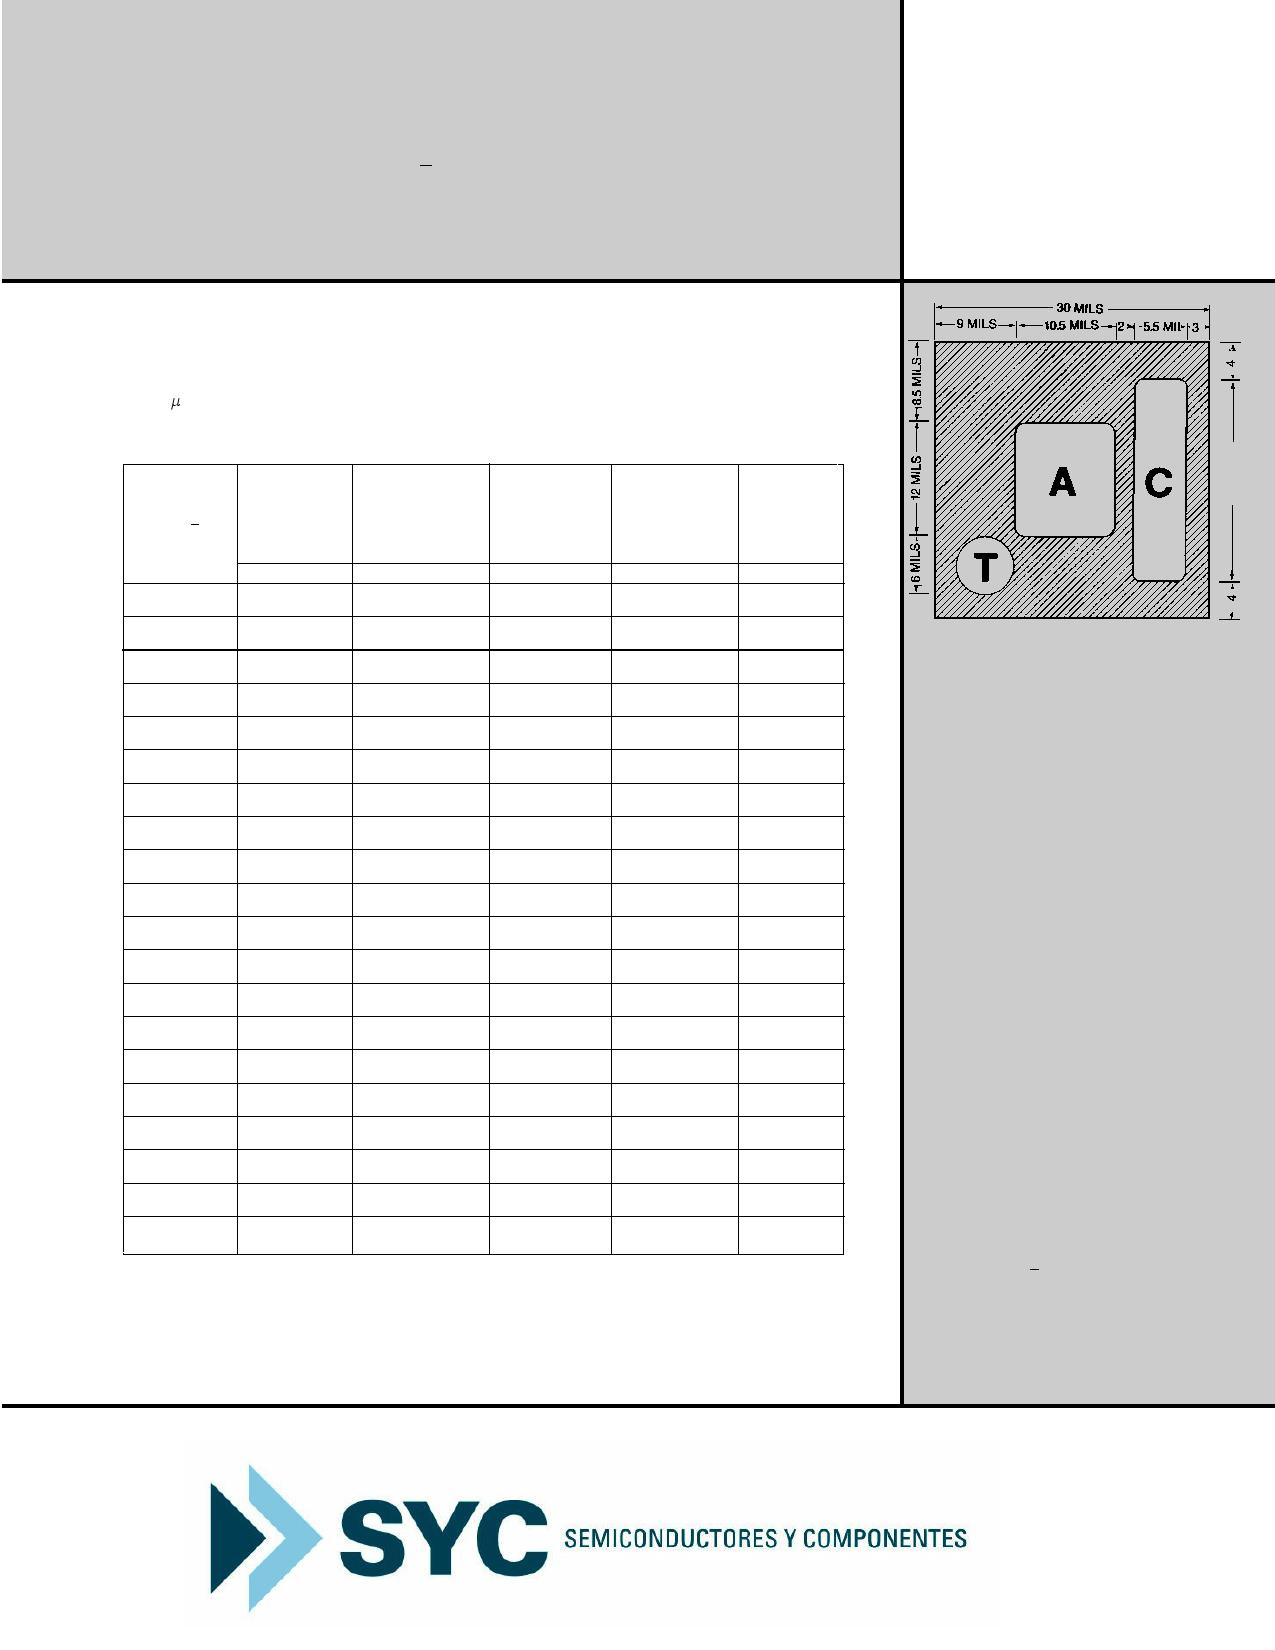 Cd4584 datasheet